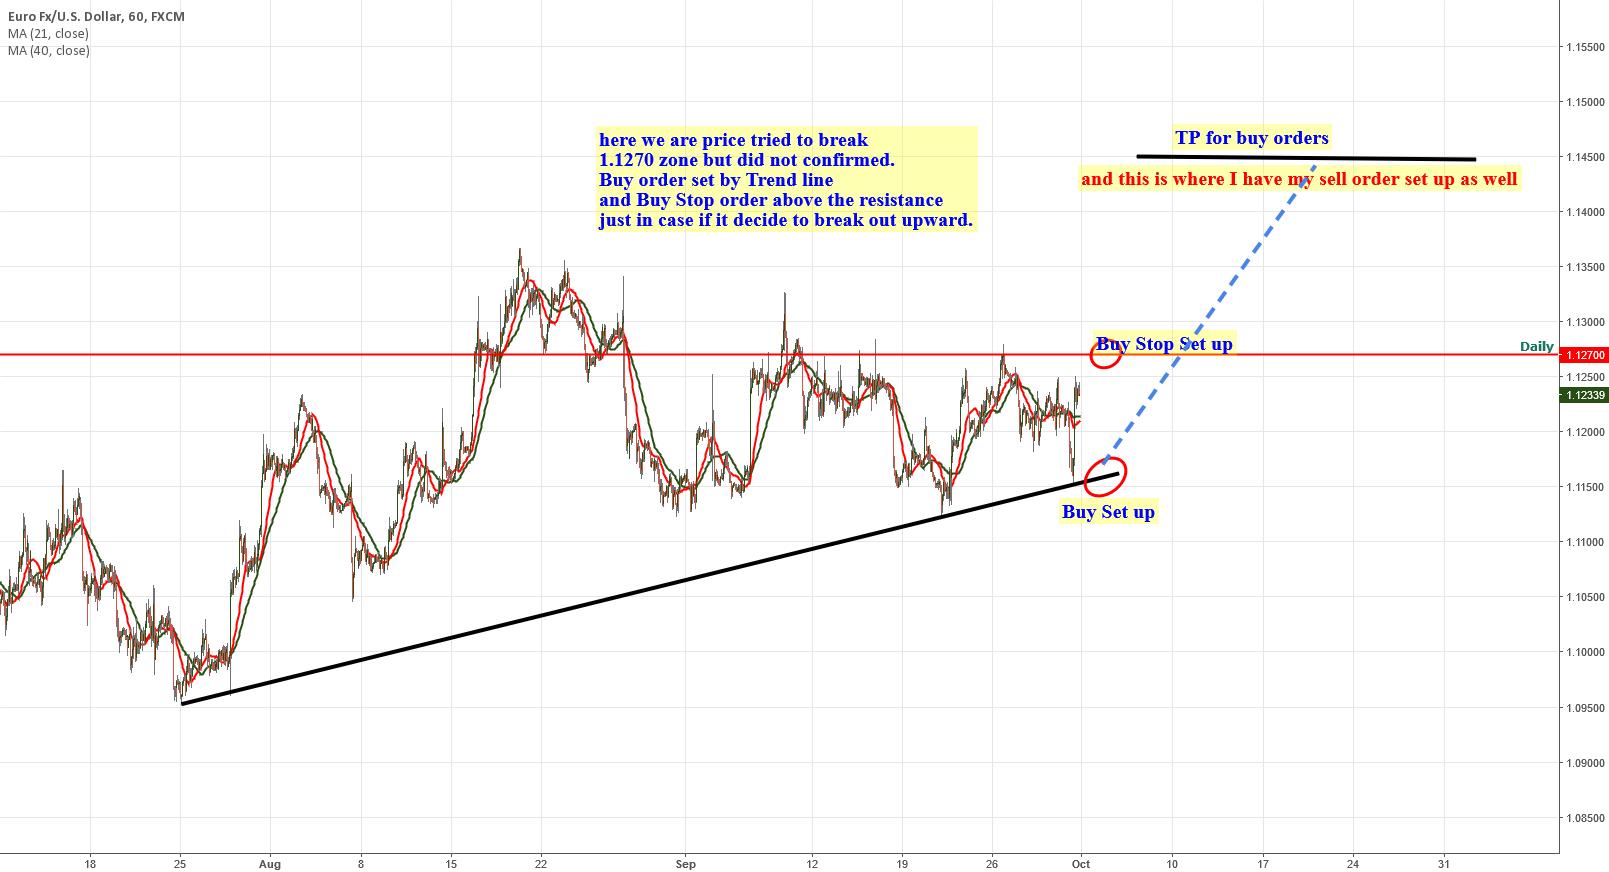 EURUSD Houly chart Buy order set up